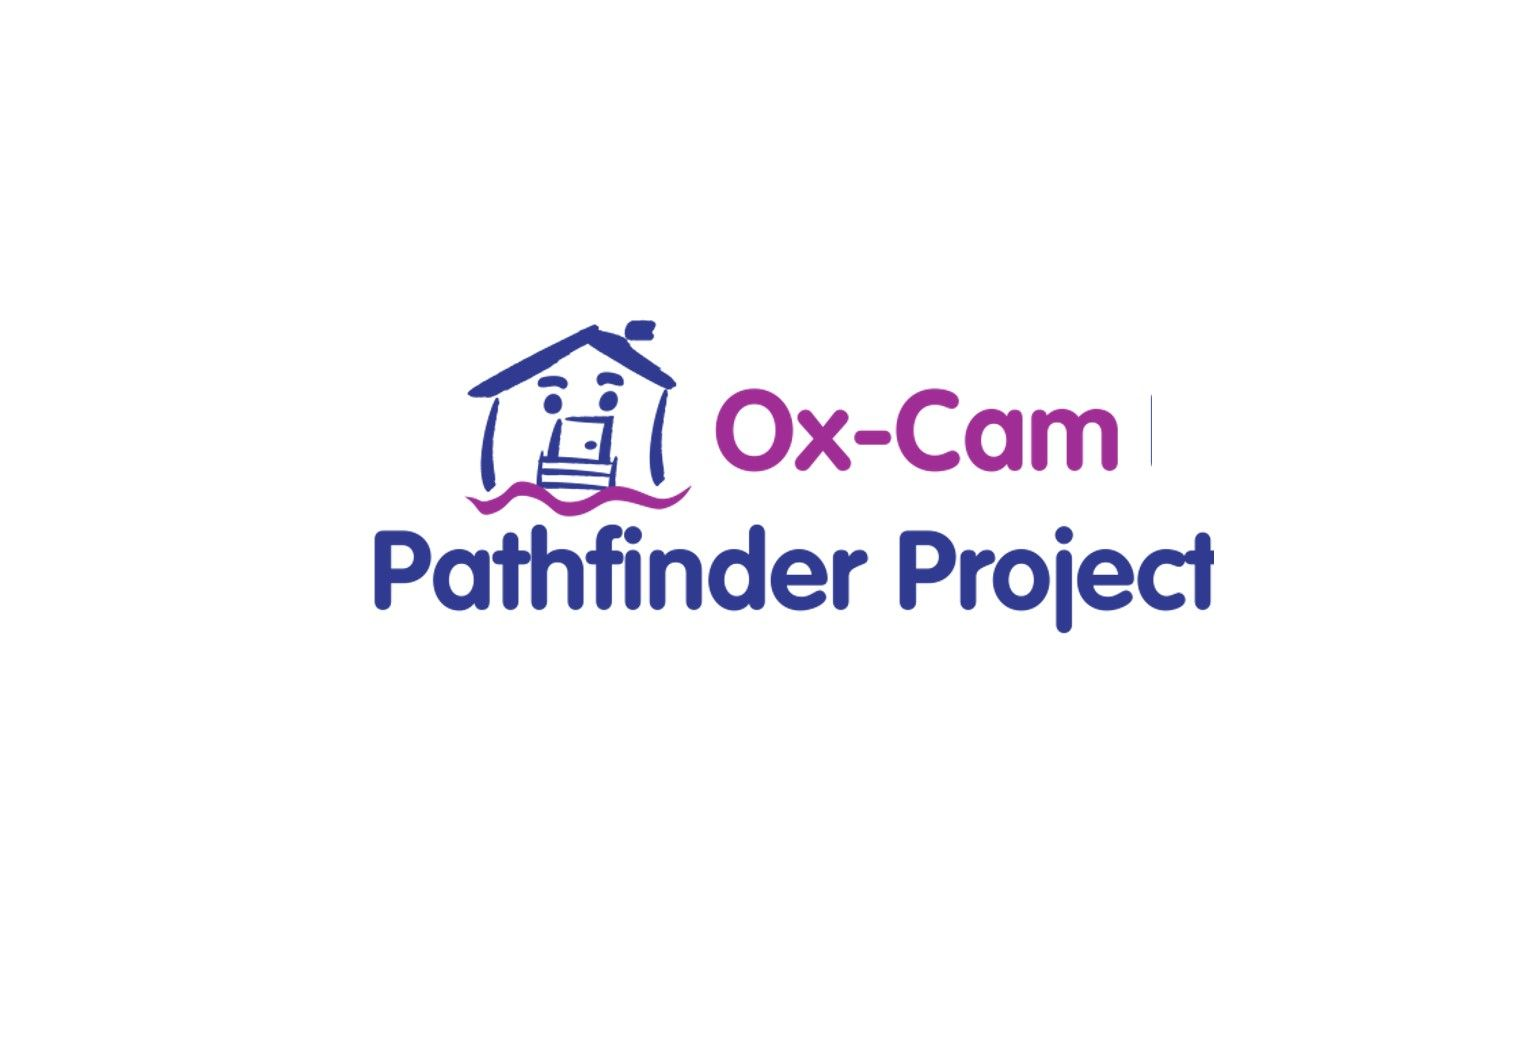 Ox-Cam Pathfinder Project